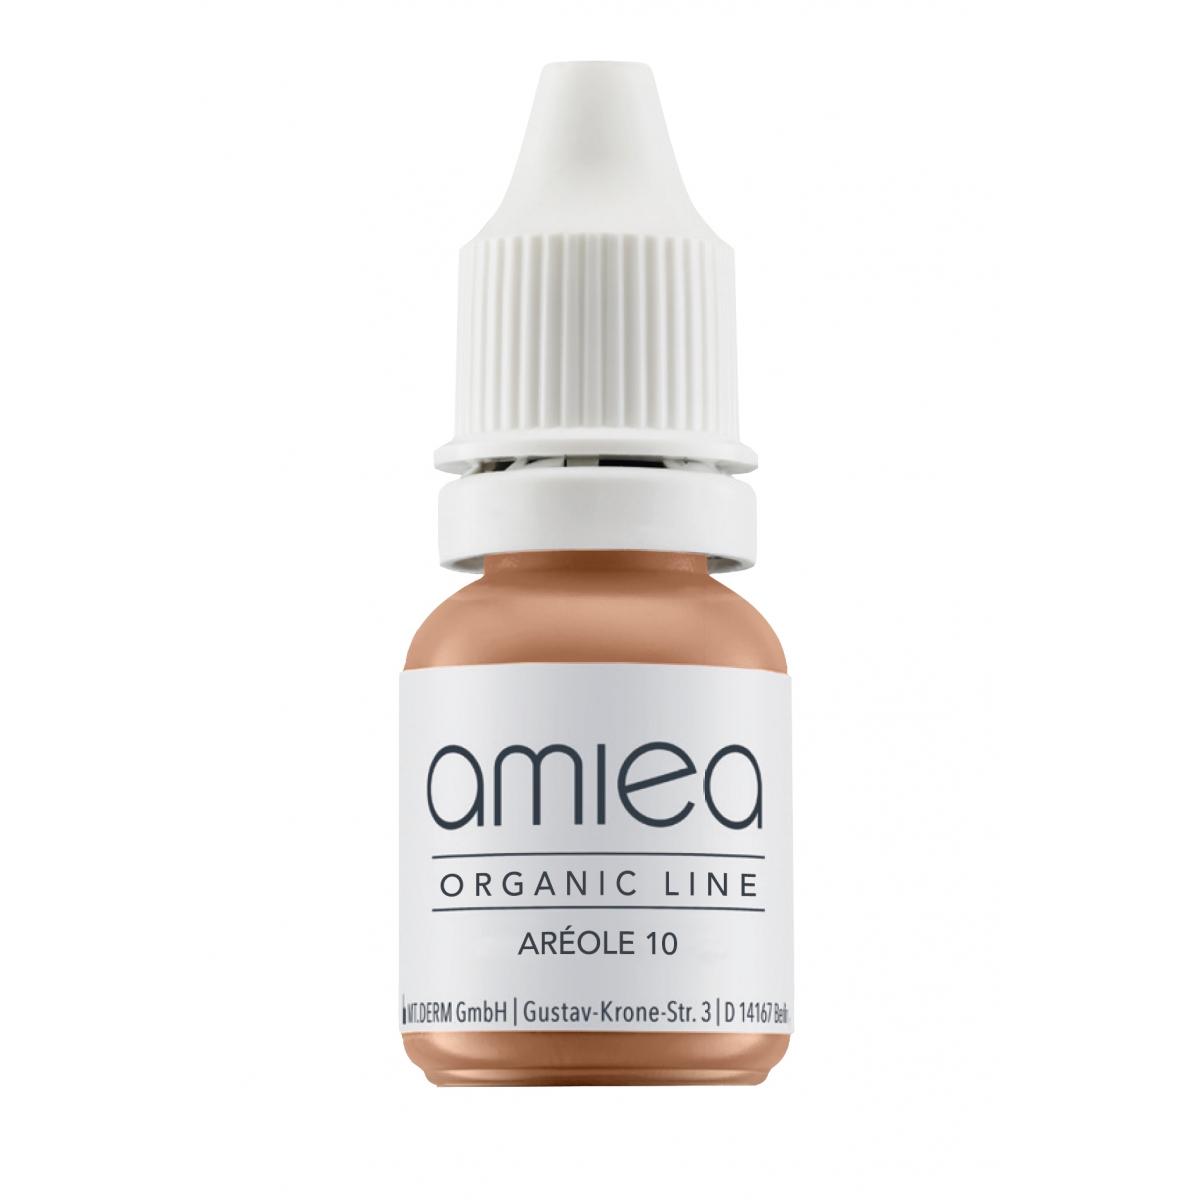 ORGANIC LINE (5ml)  - PIGMENT AREOLES 10 ORGANICLINE AMIEA (5 ml)